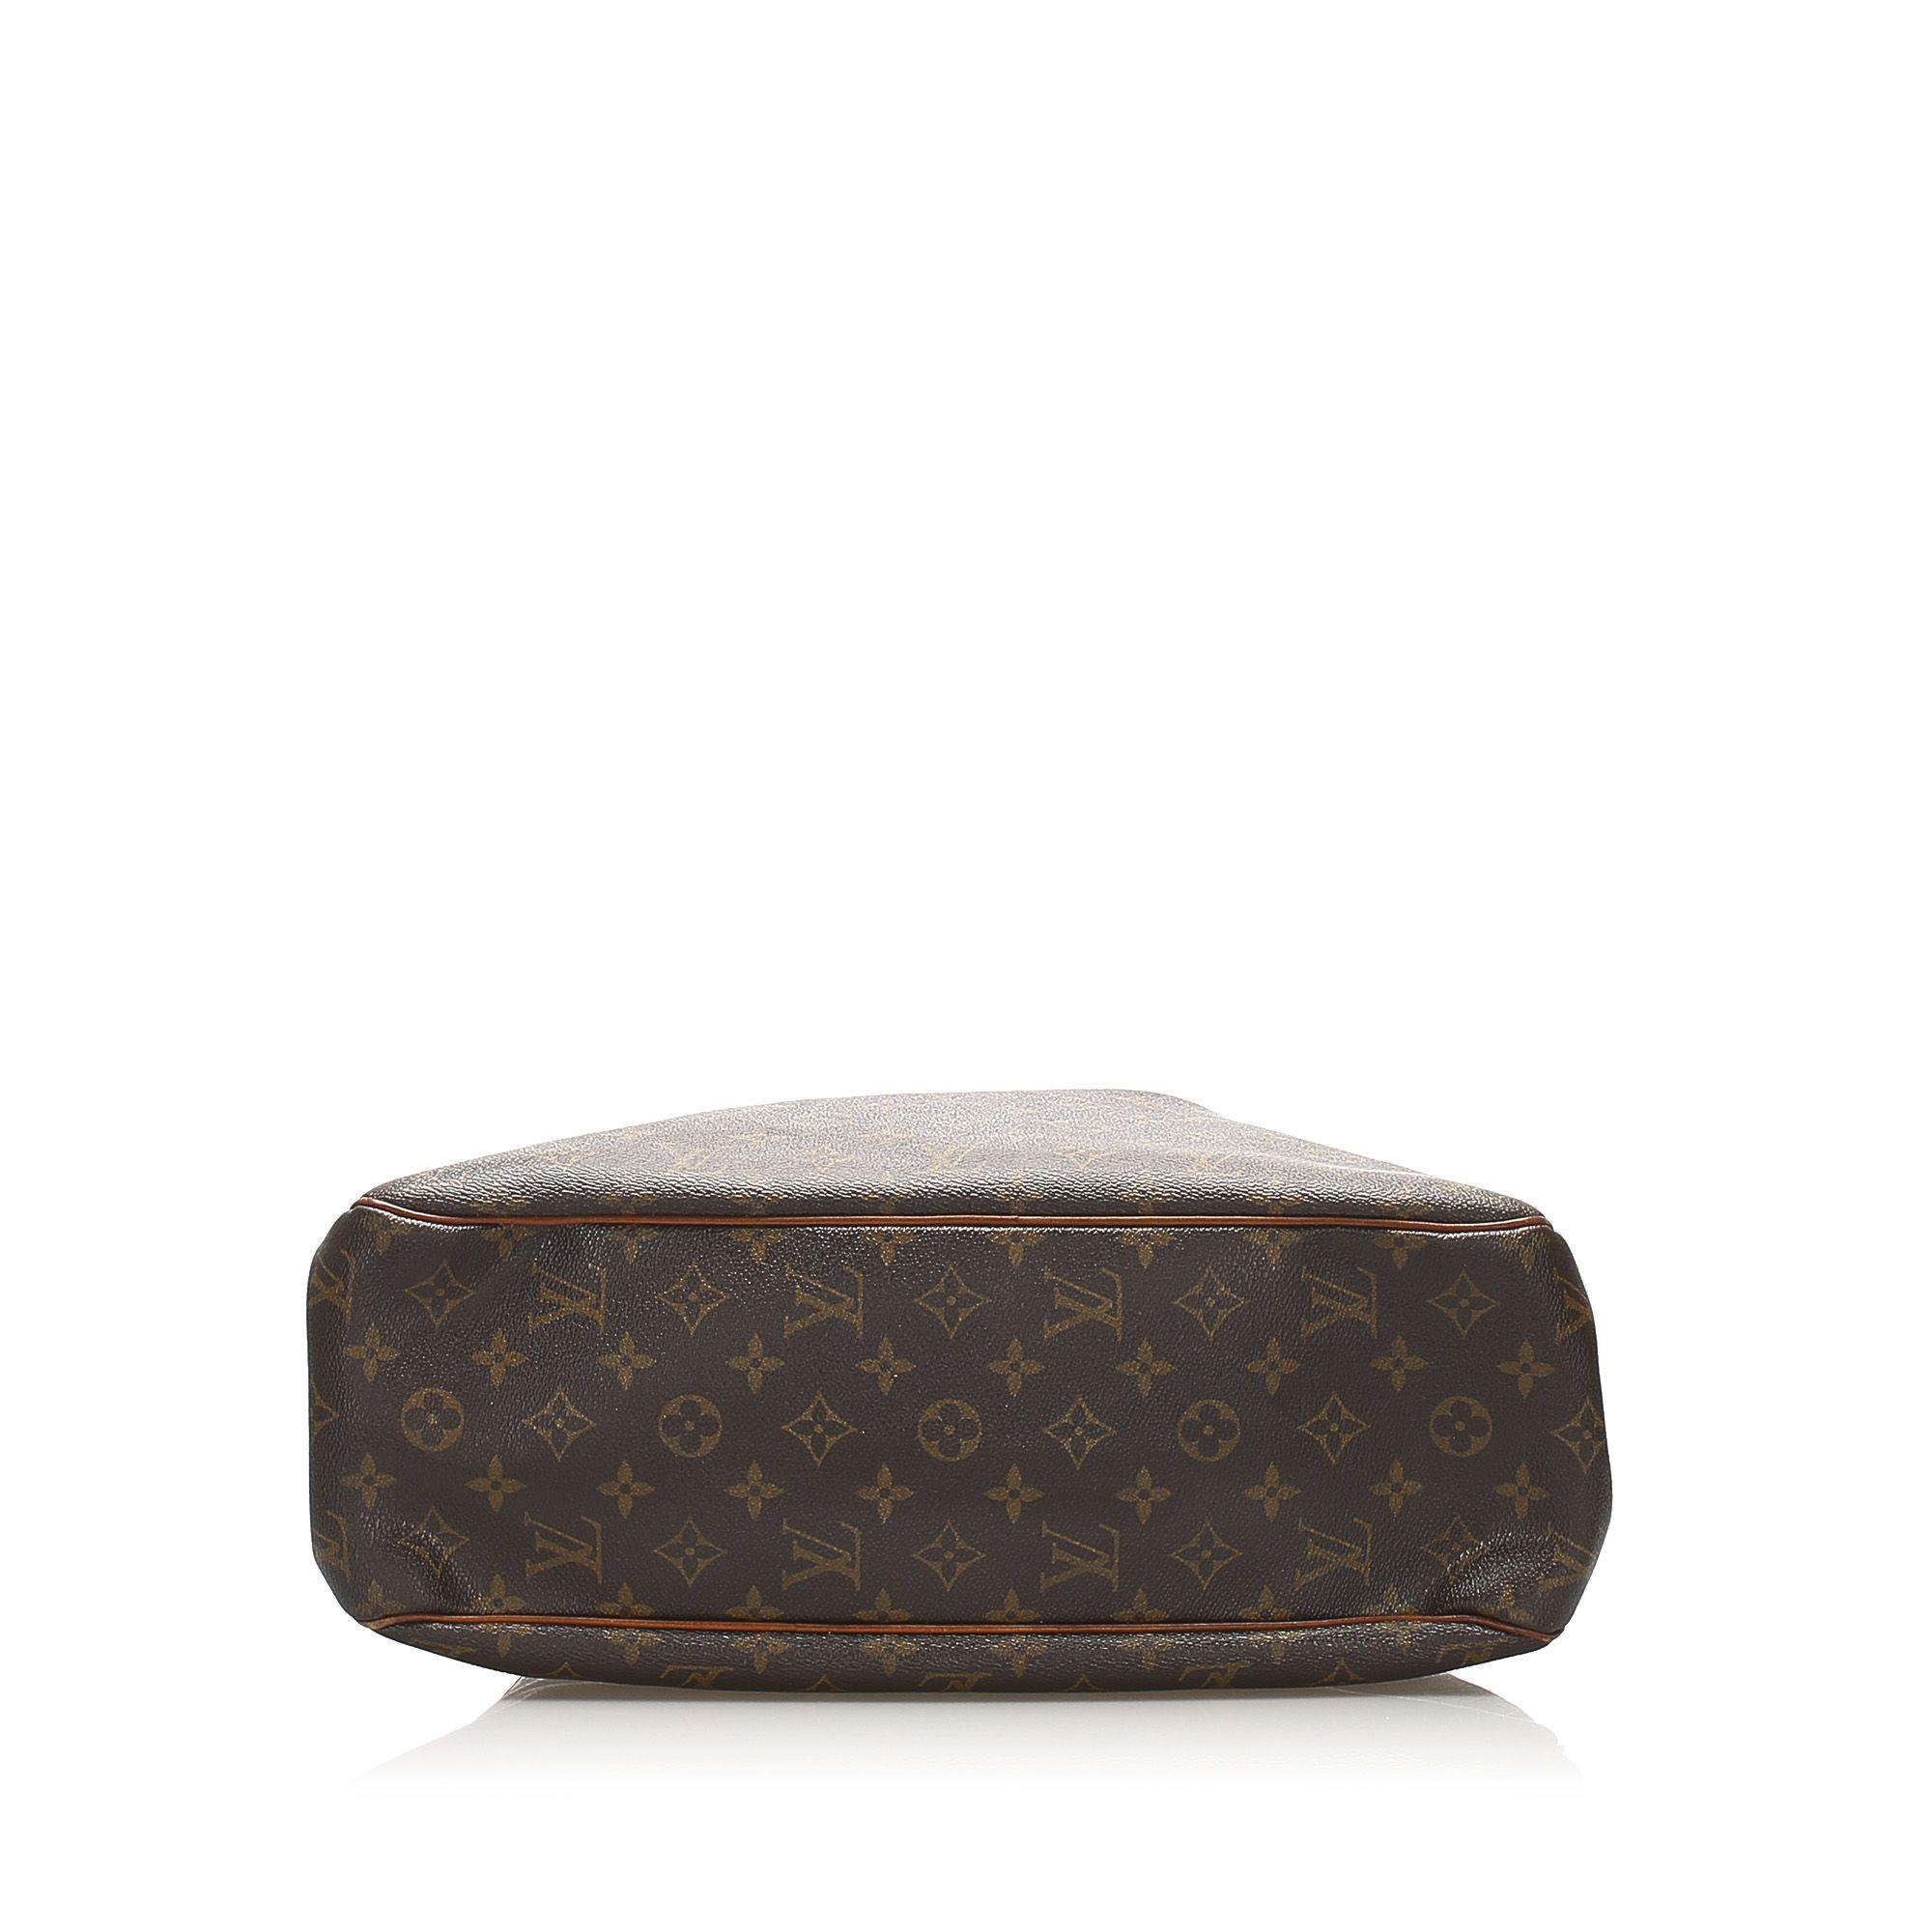 Vintage Louis Vuitton Monogram Batignolles Horizontal Brown